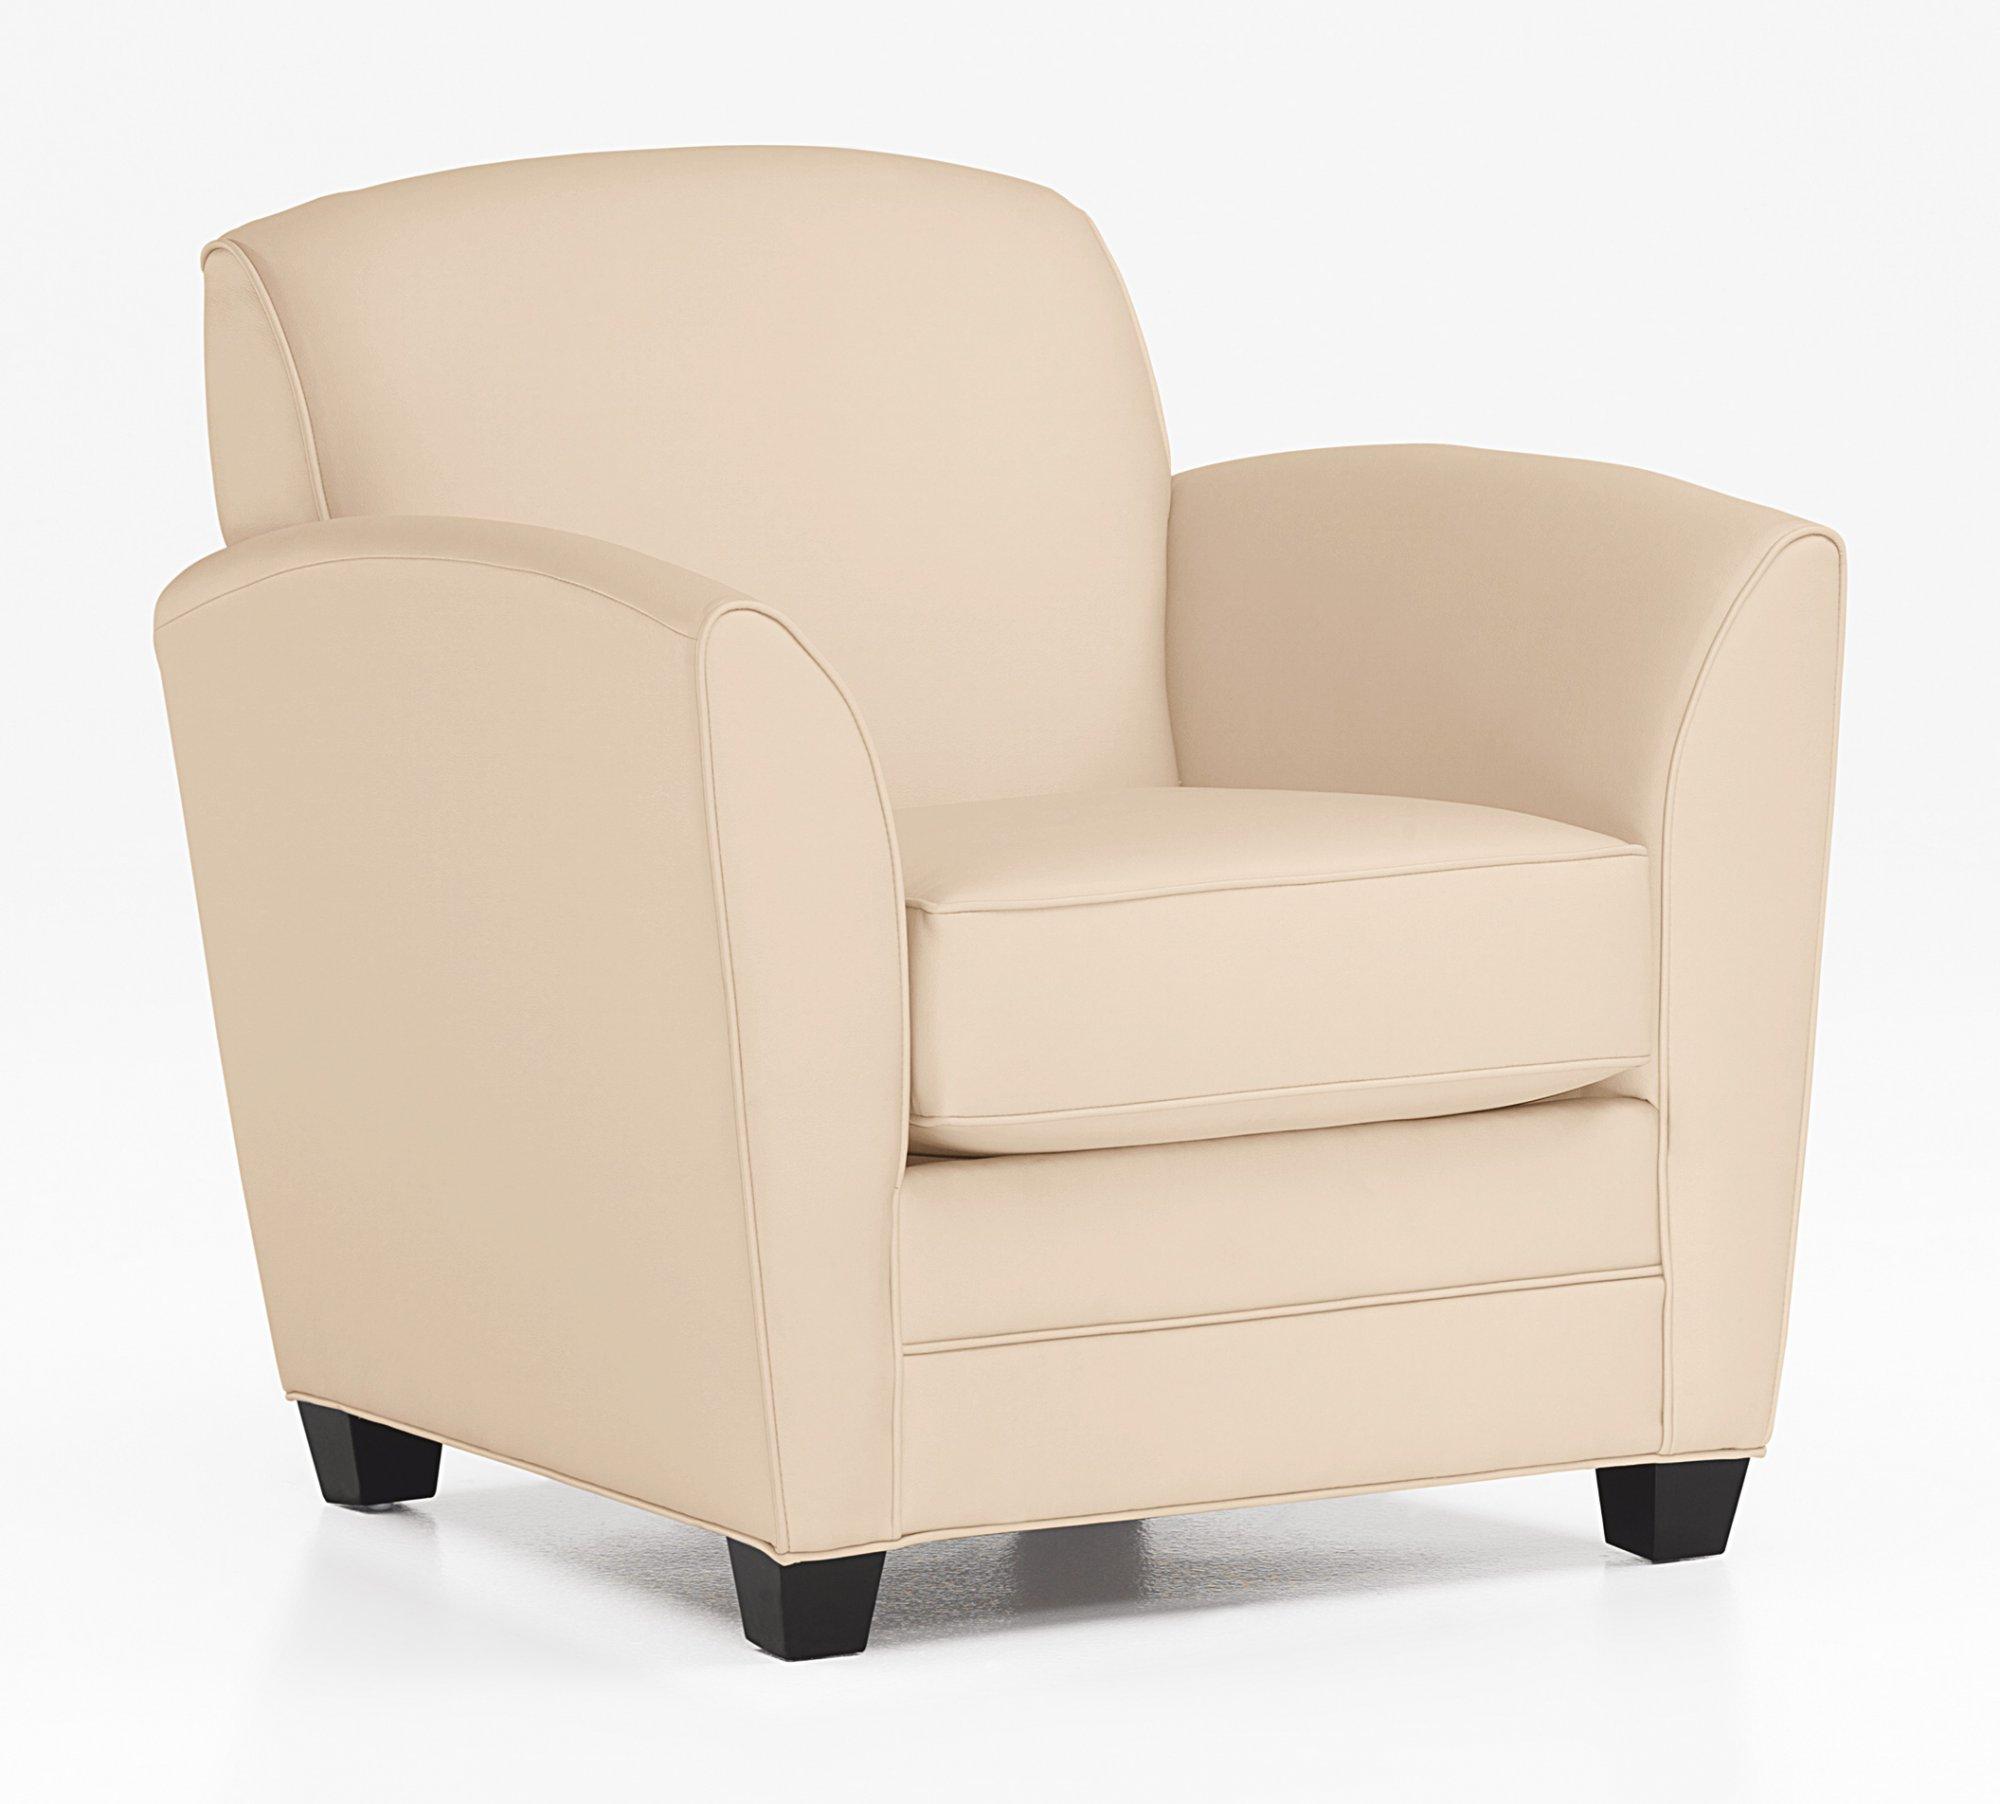 Astonishing Flexsteel Ch100 10 Lemans Chair Highway Appliance Pdpeps Interior Chair Design Pdpepsorg